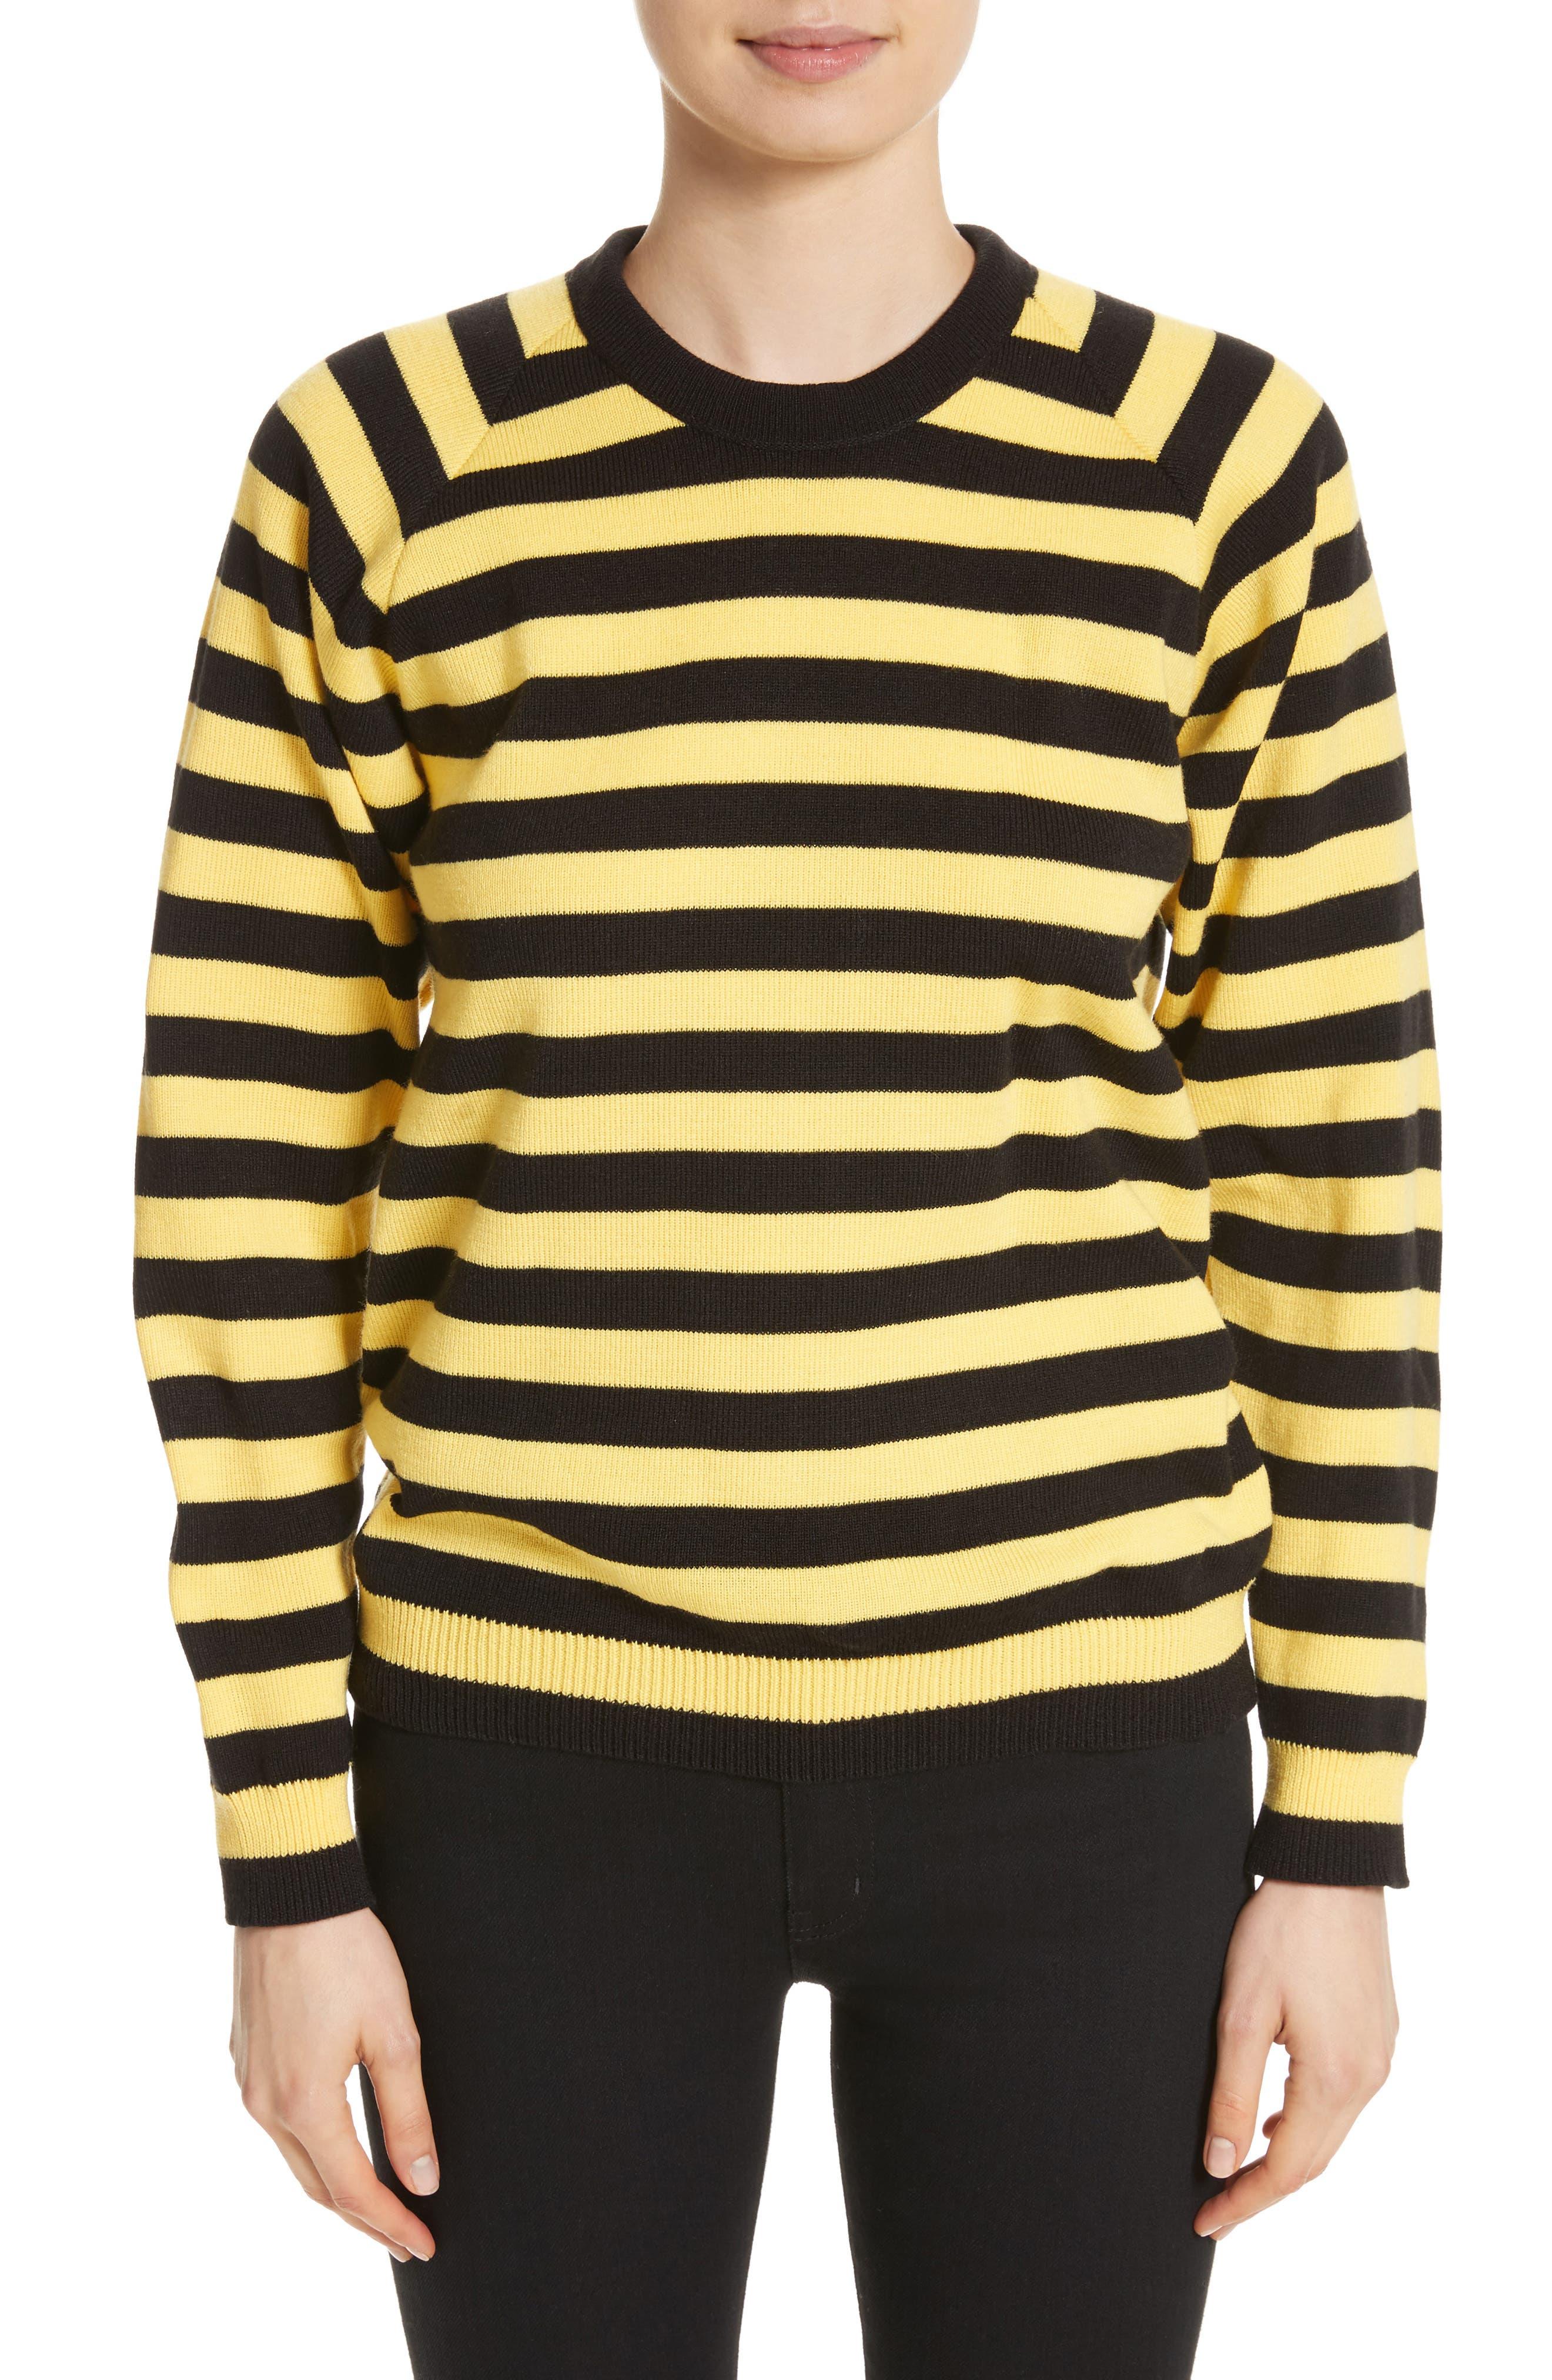 Main Image - Molly Goddard Bumblebee Stripe Sweater